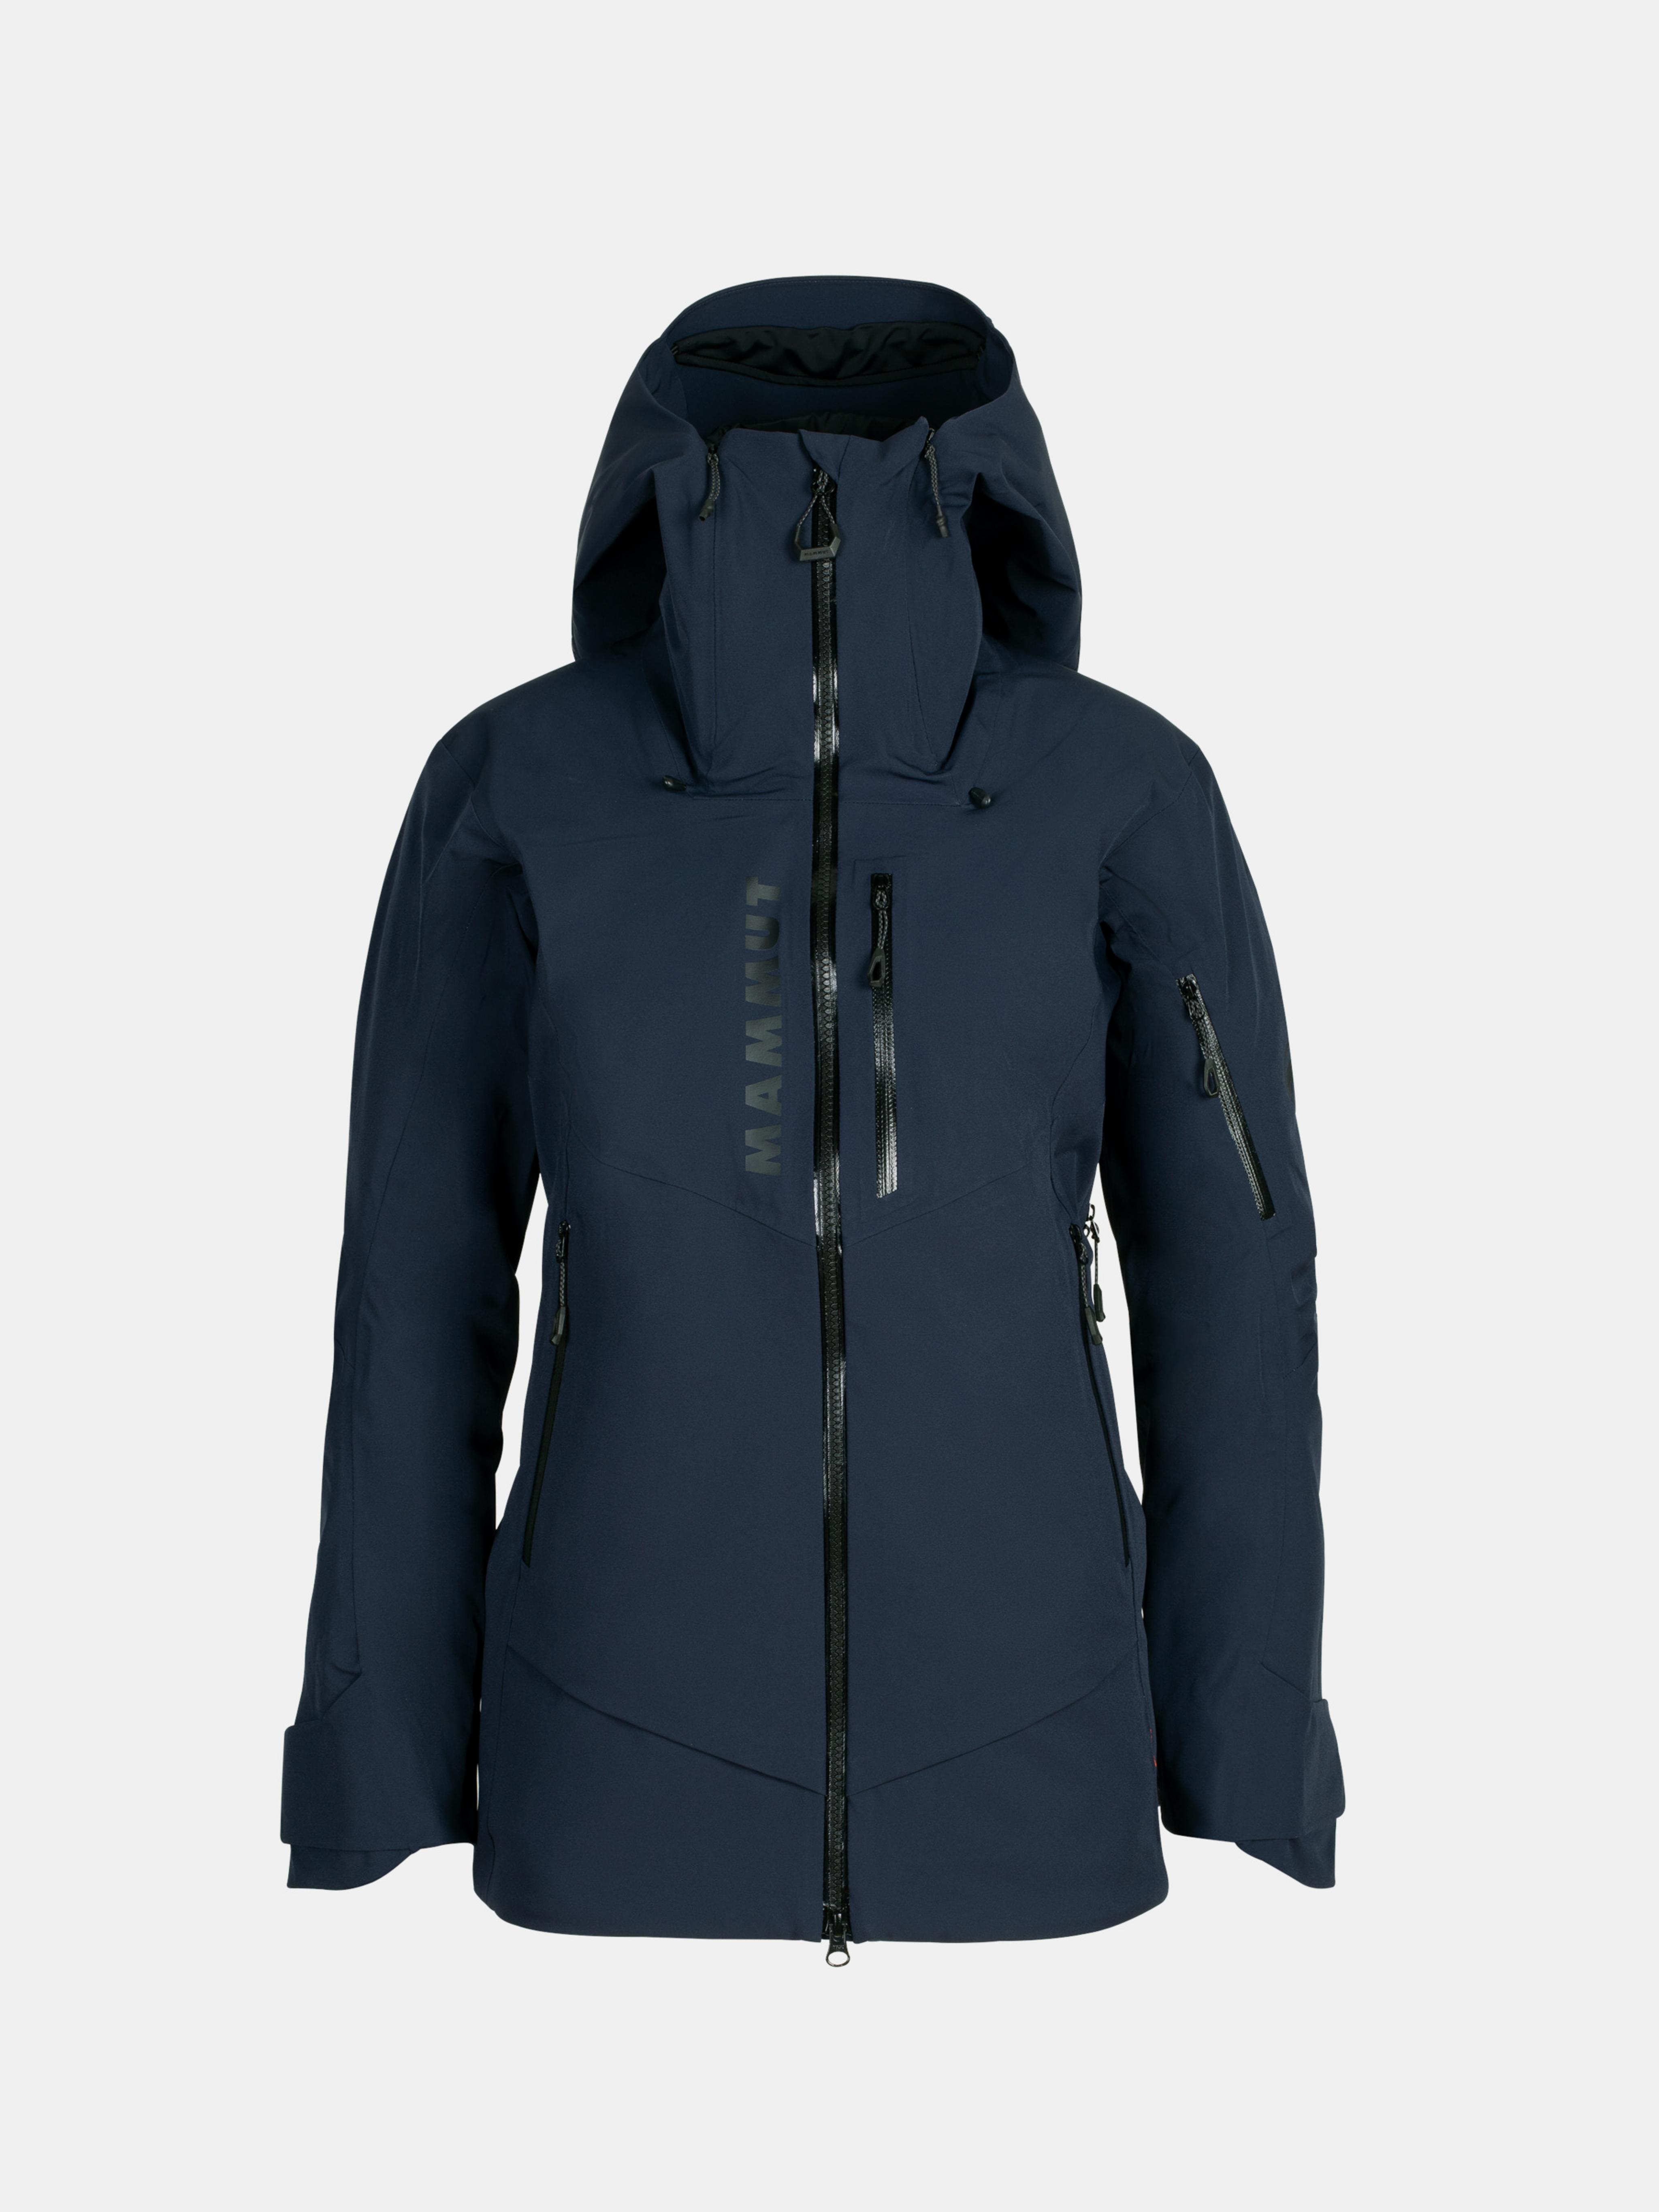 La Liste HS Thermo Hooded Jacket Women image